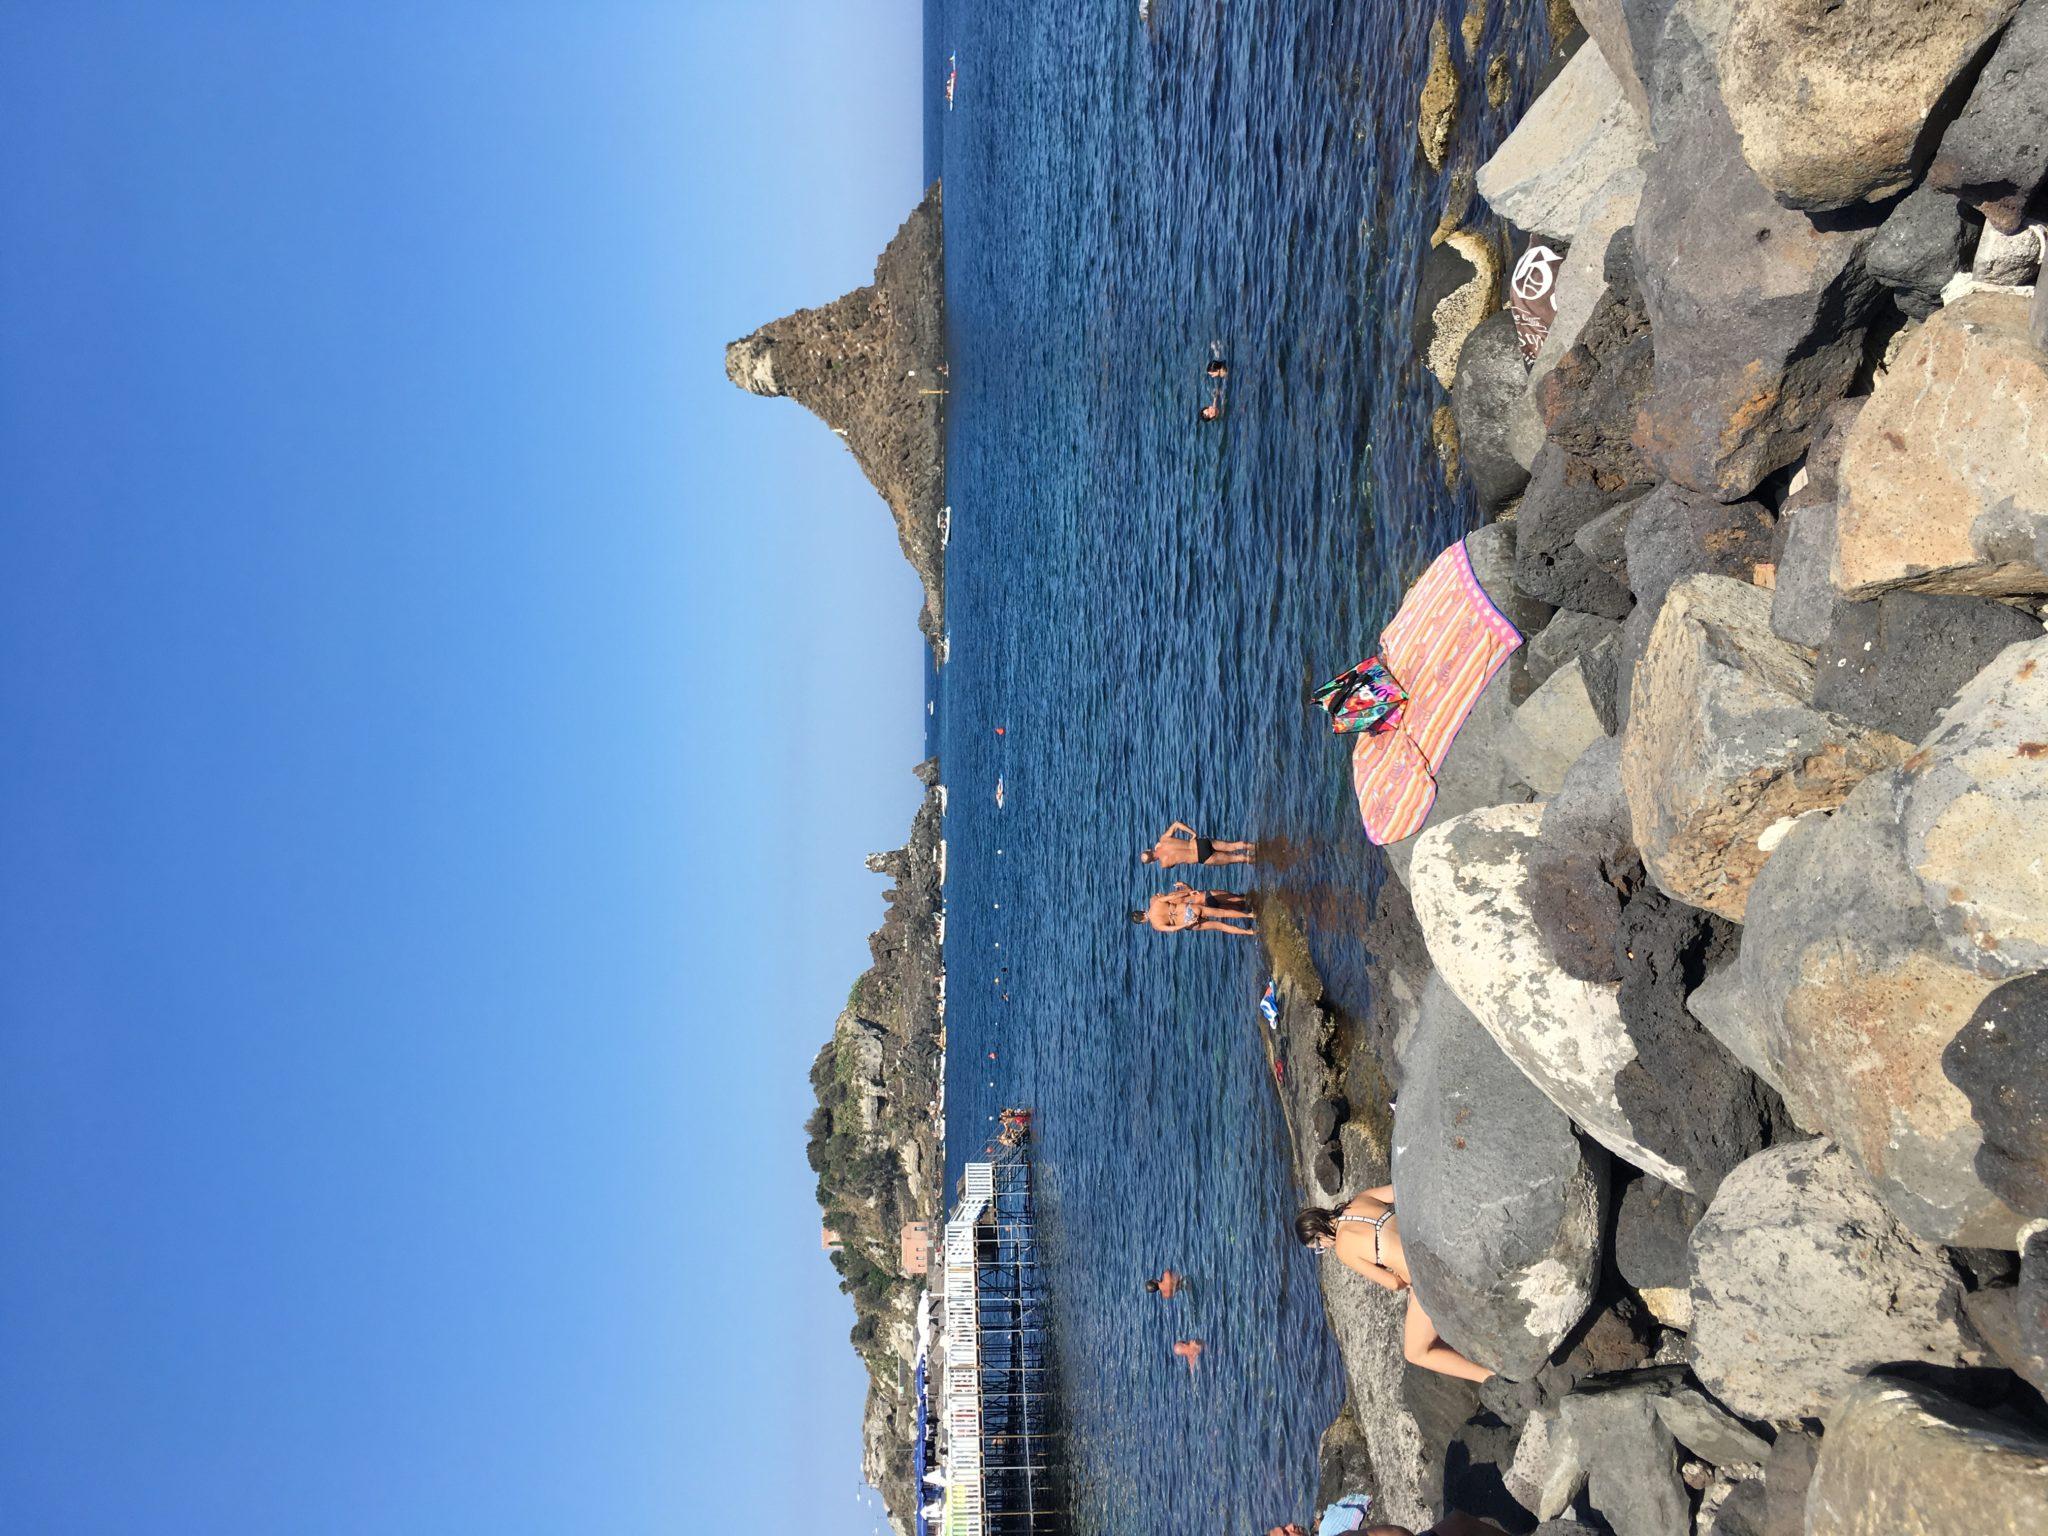 Каменистые пляжи Катании, Сицилия, Италия